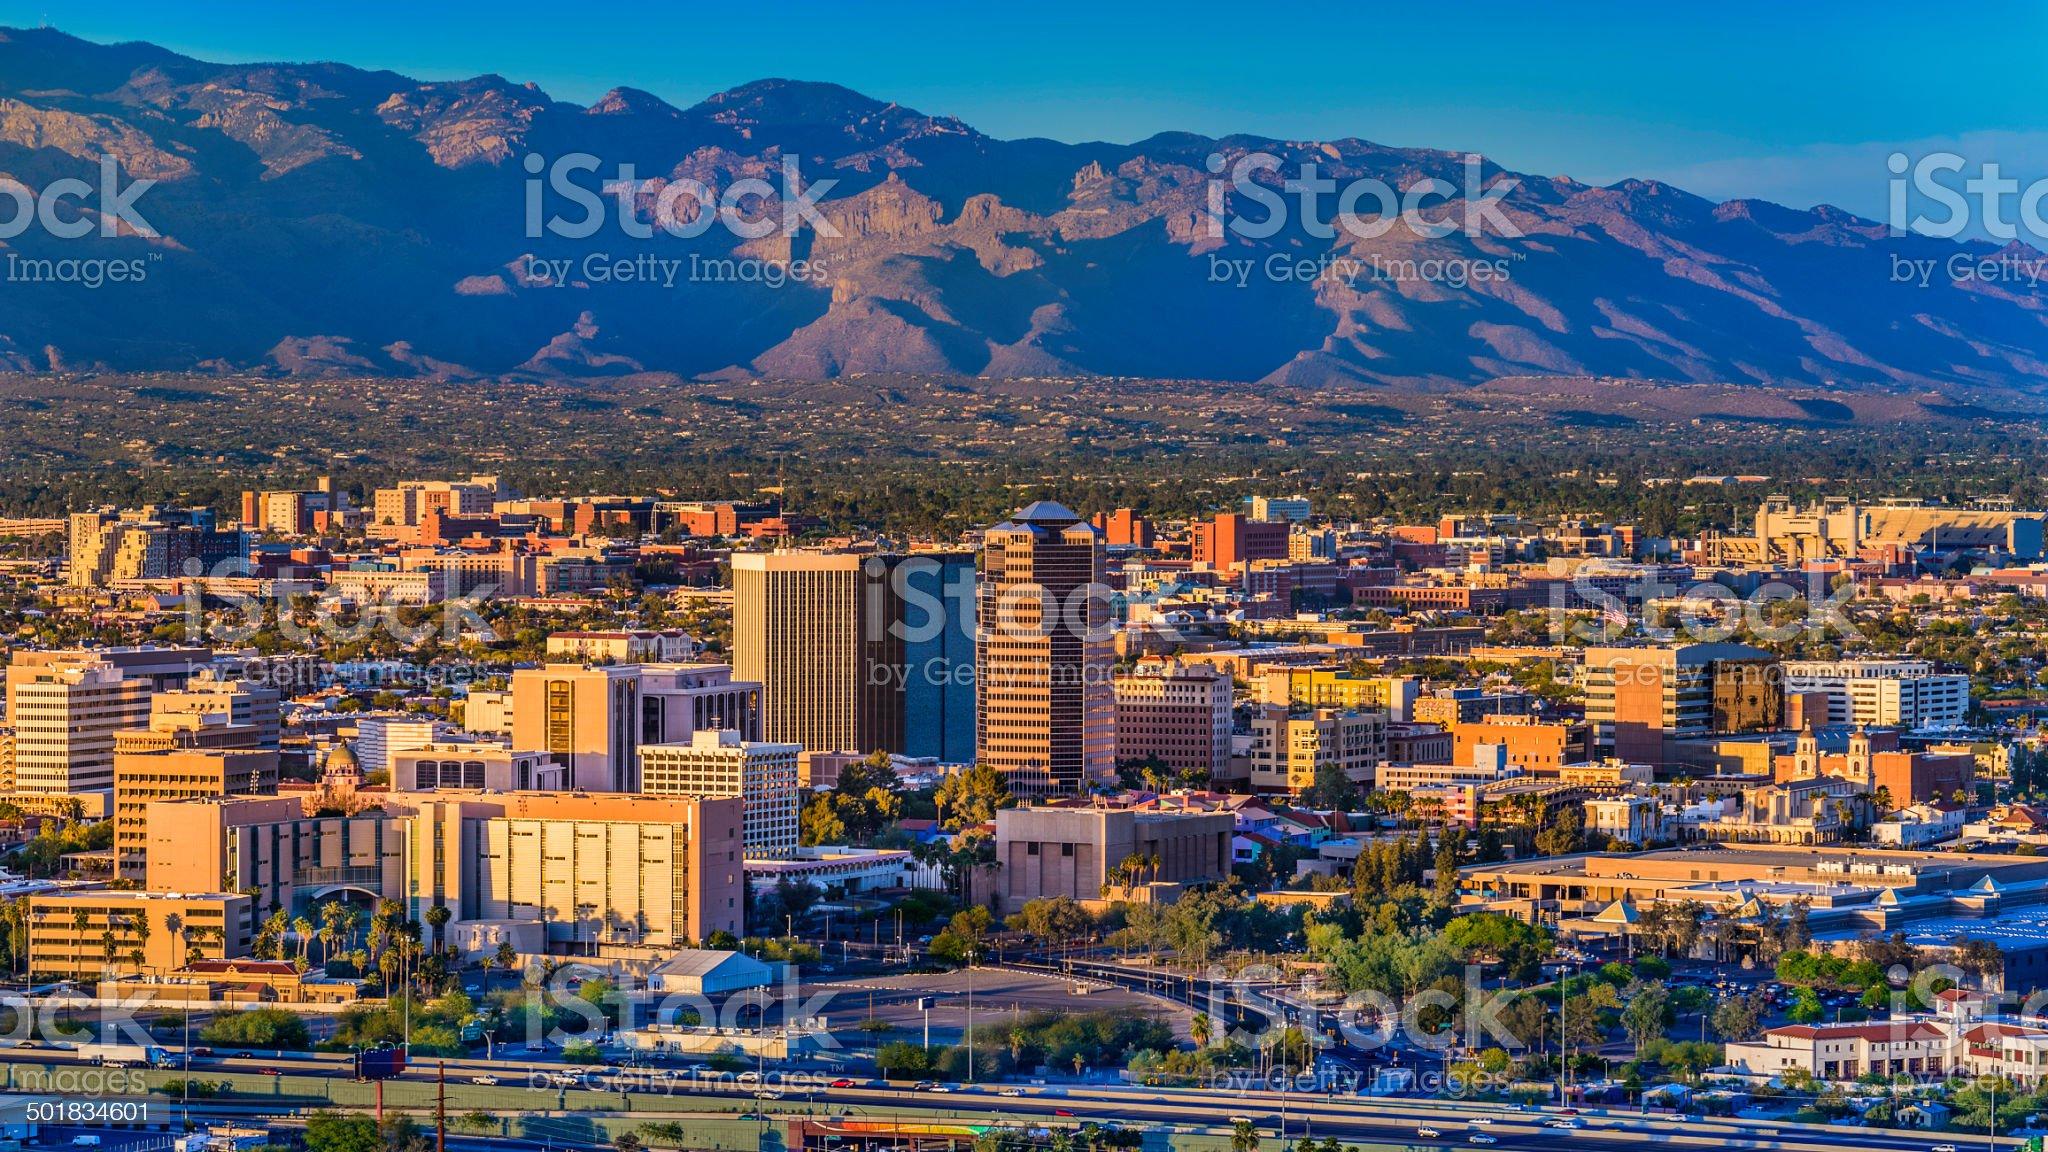 Tucson Arizona skyline cityscape and Santa Catalina Mountains at sunset royalty-free stock photo